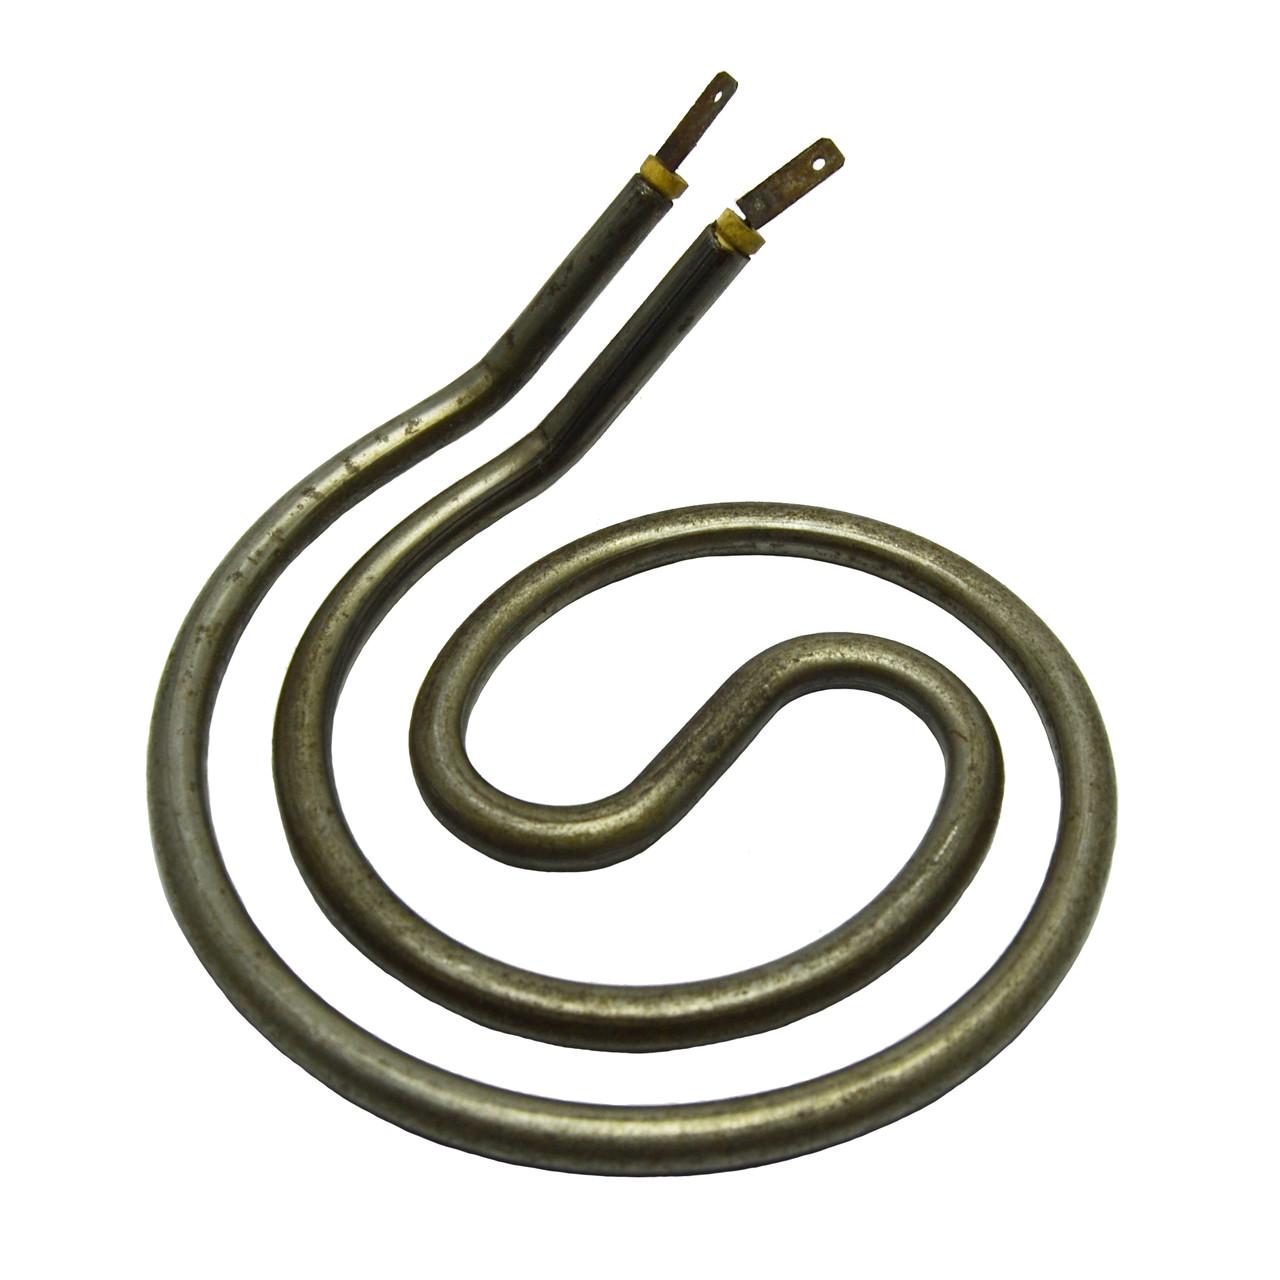 Тэн для электроплиты 1000W (металл, 145 мм)